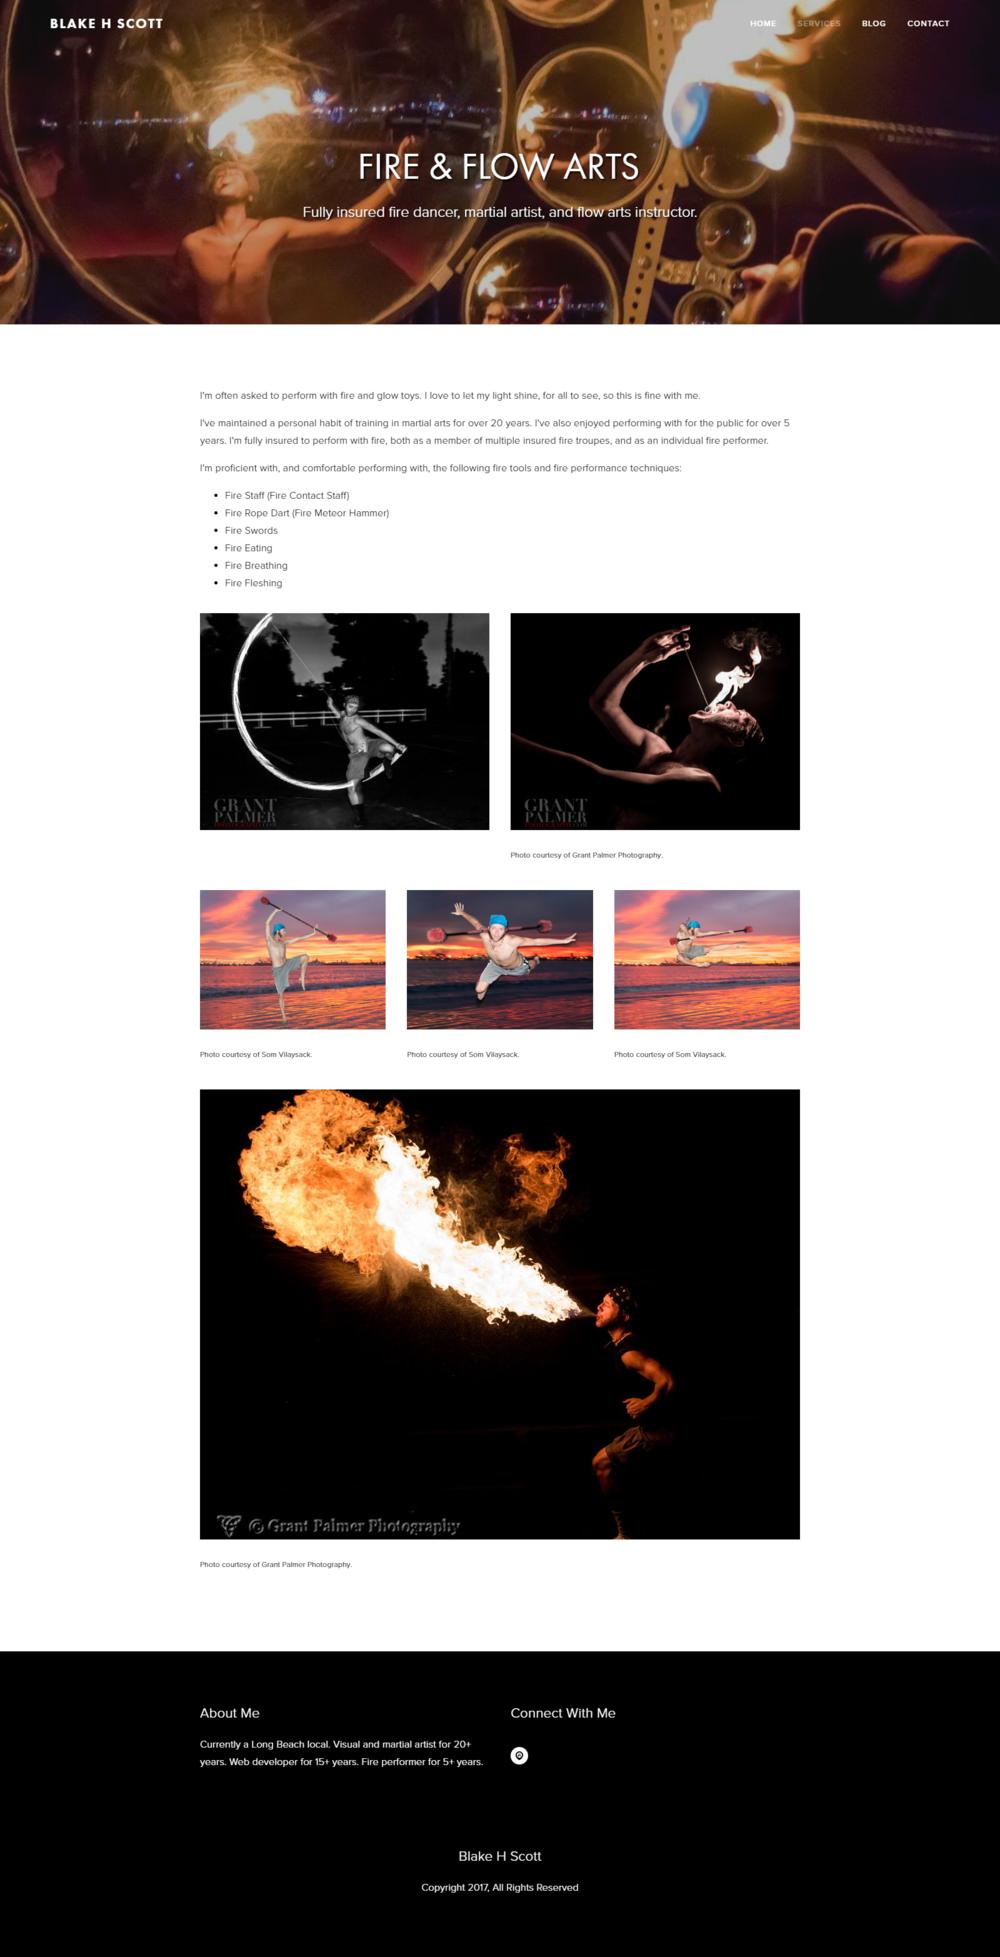 screencapture-blake-scott-633a-squarespace-fire-performance-1493017165152.png